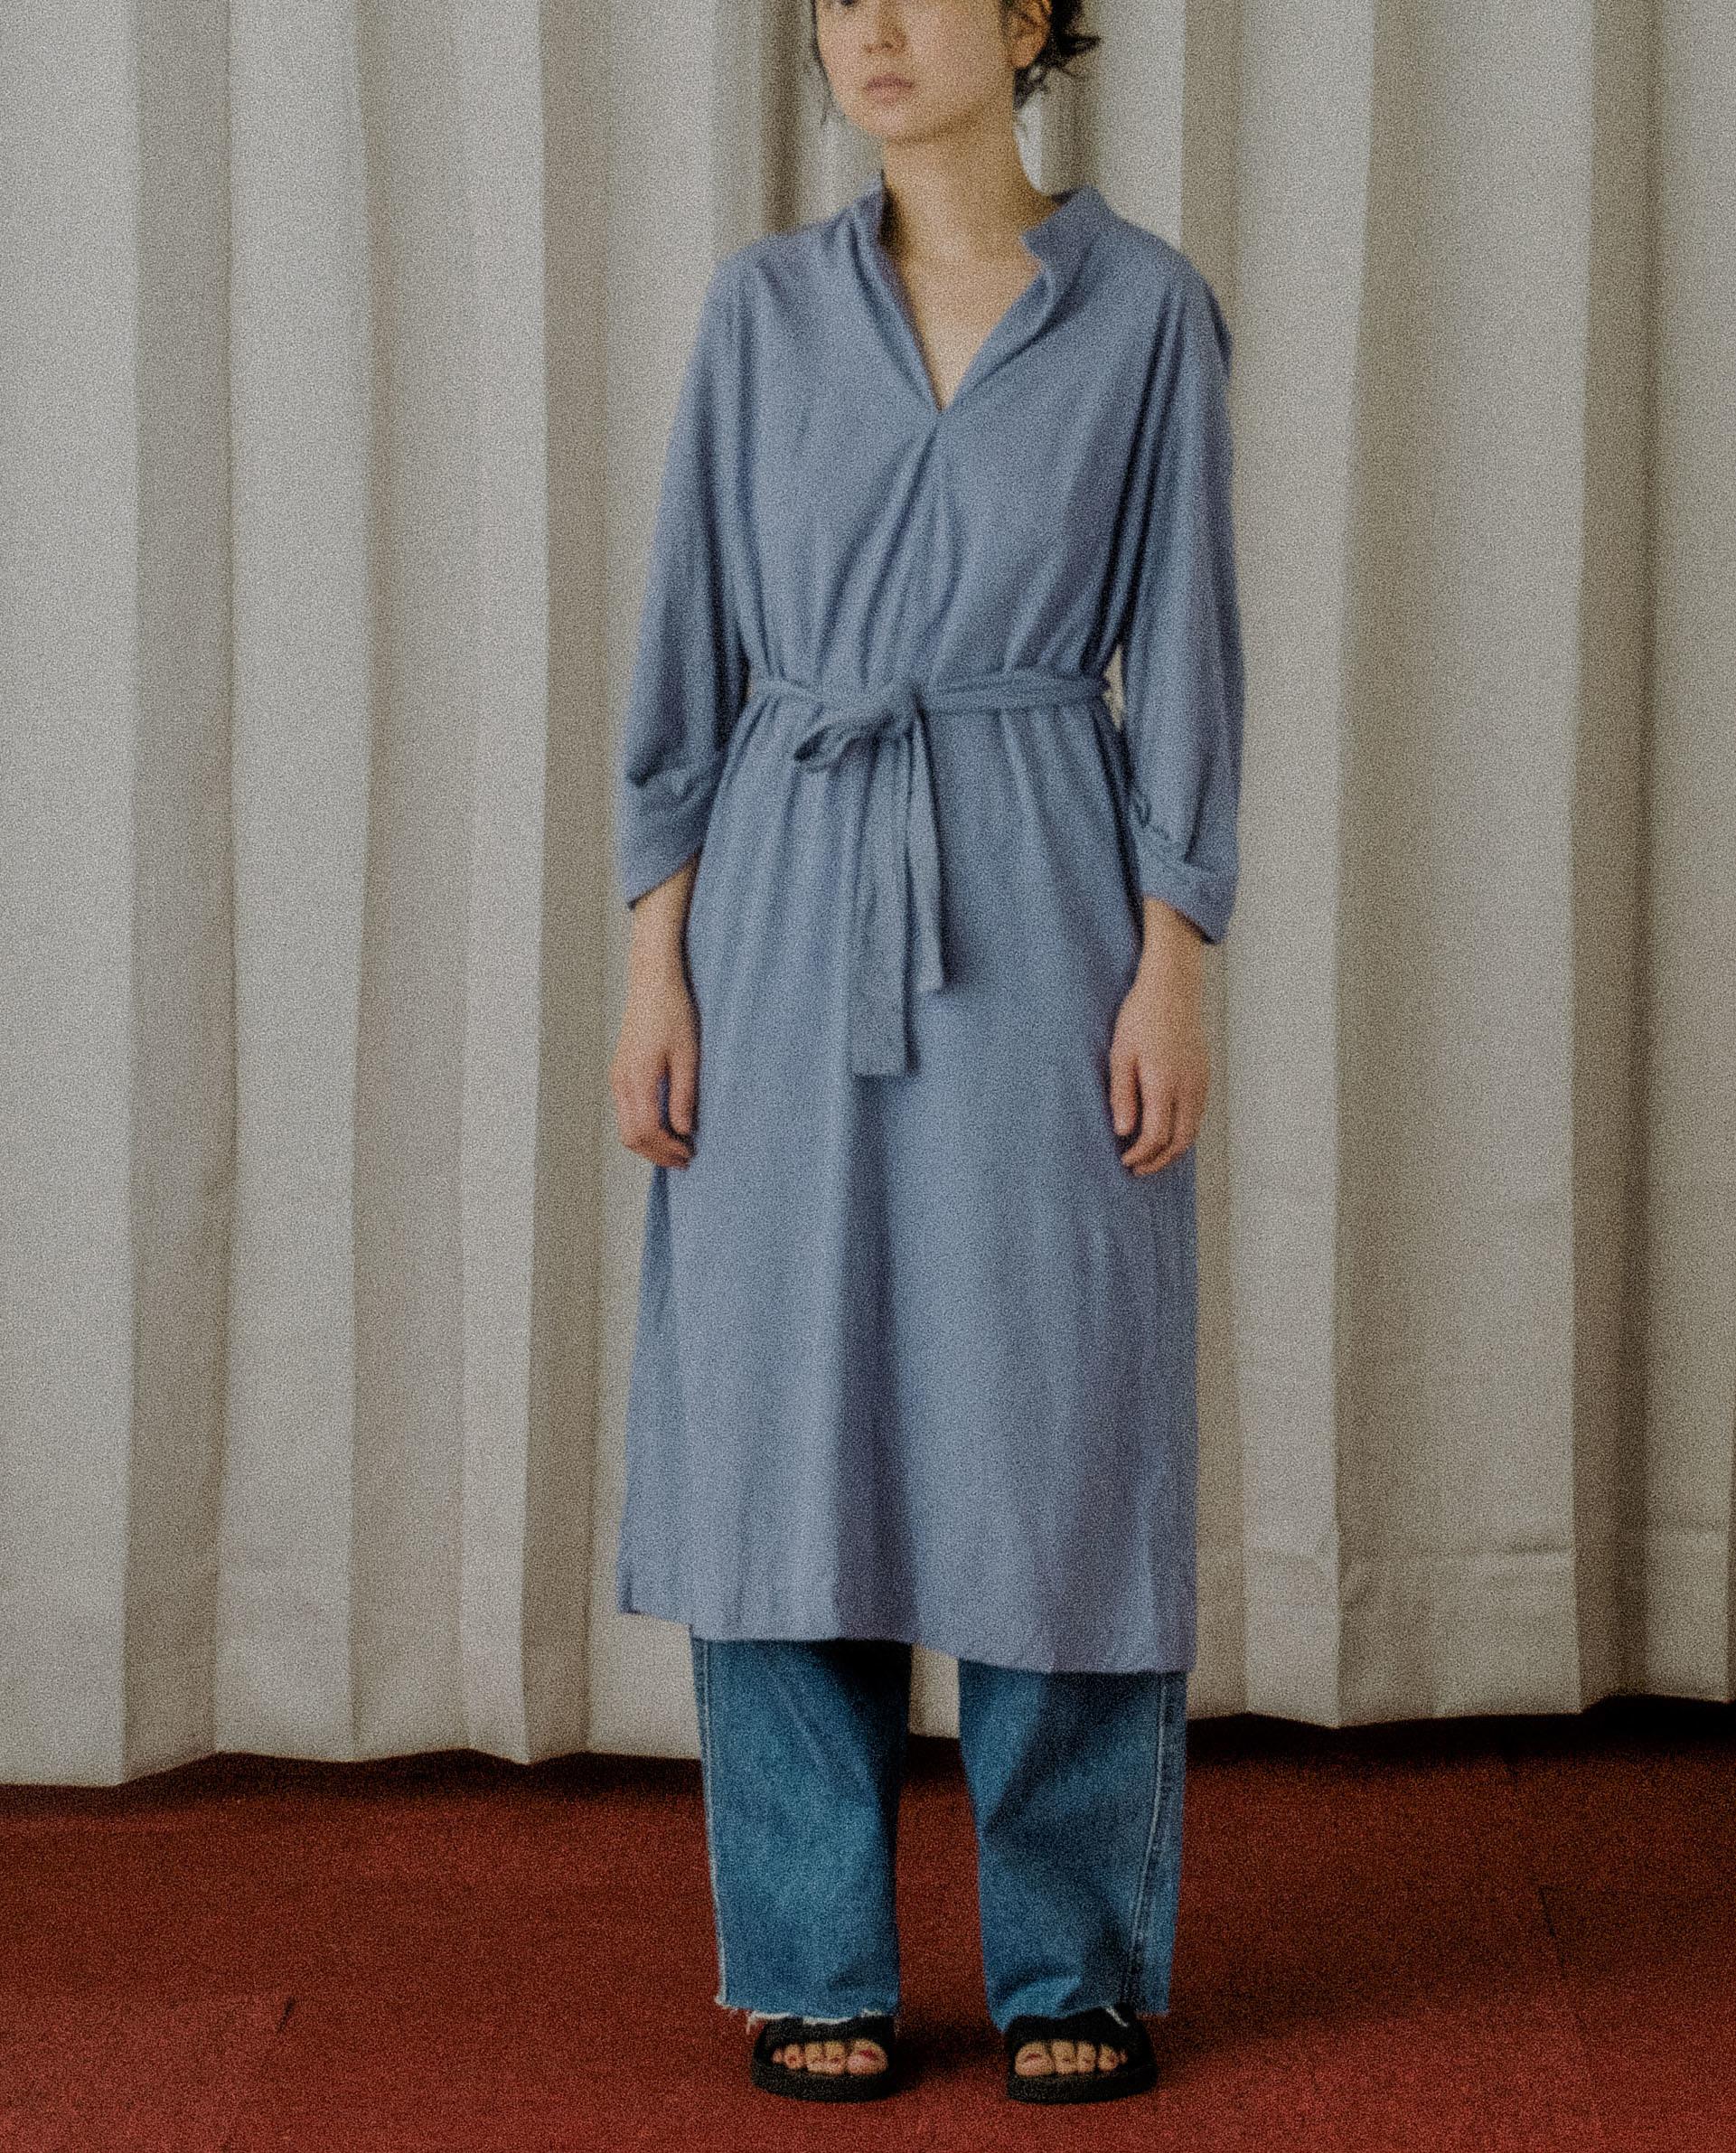 Tops / Vtg 70's Ice Blue Dress. (USA)